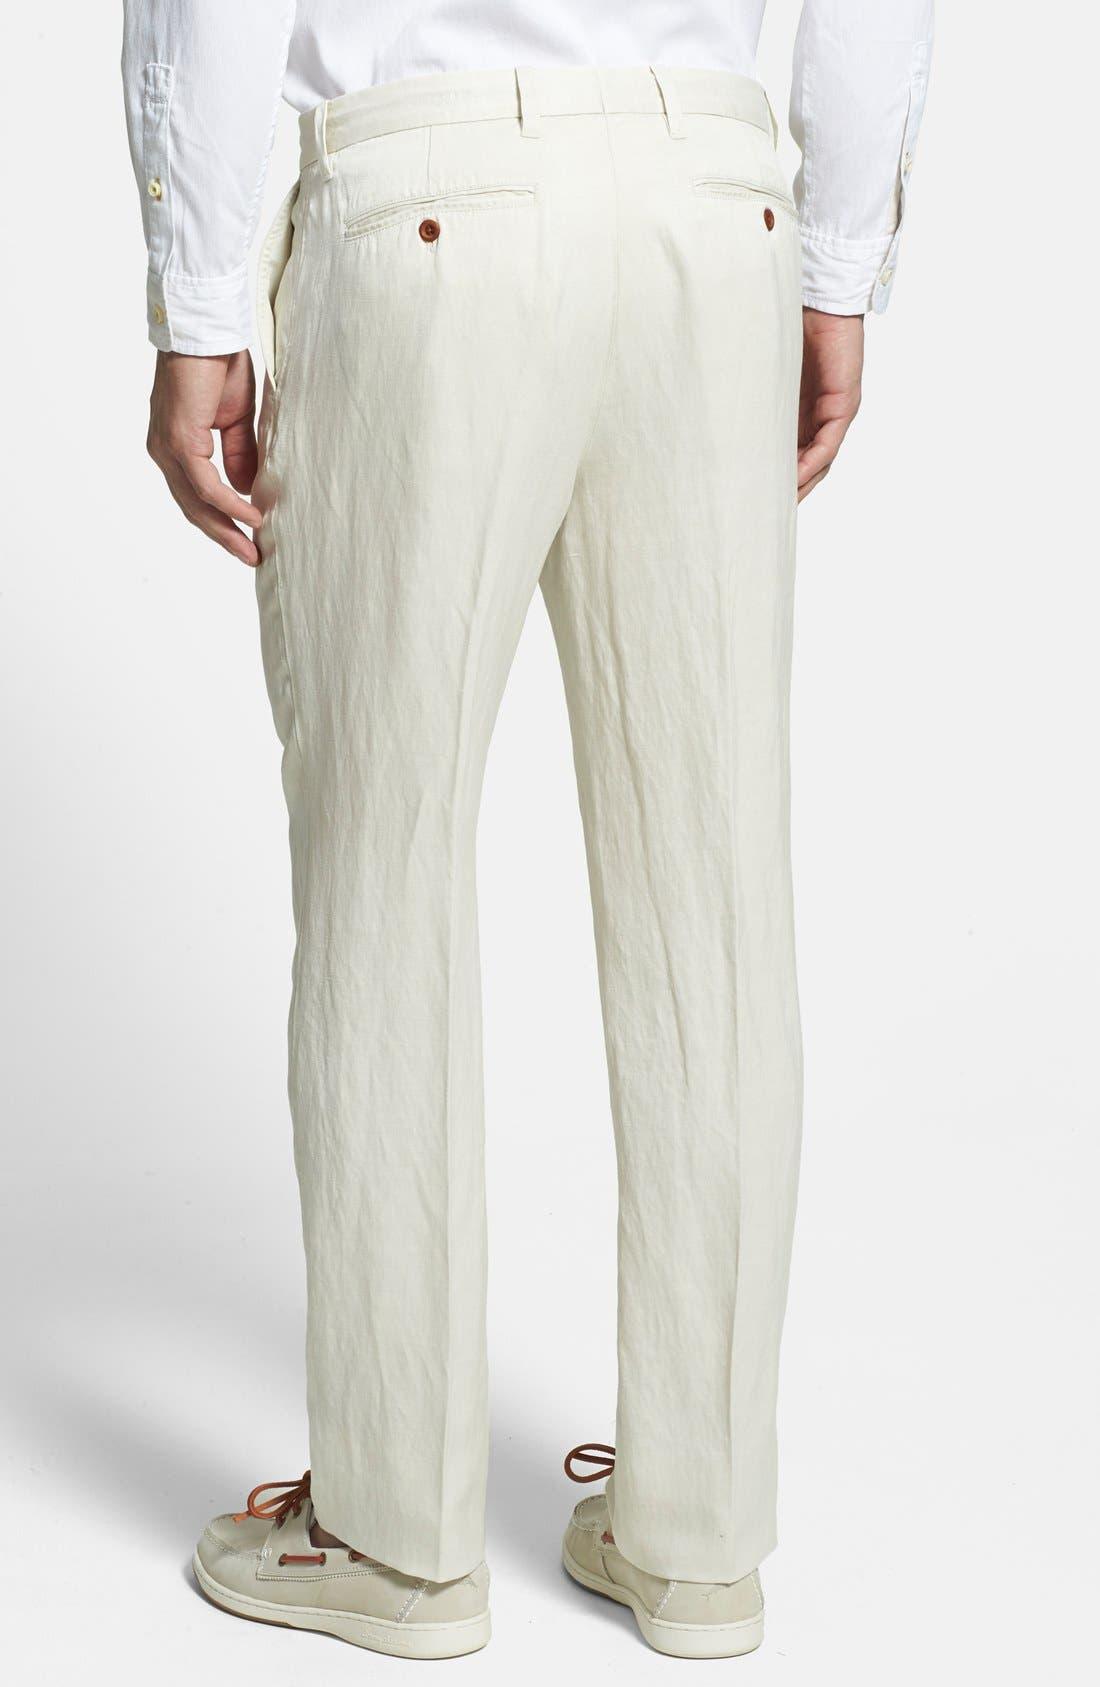 'La Jolla' Flat Front Pants,                             Alternate thumbnail 7, color,                             250